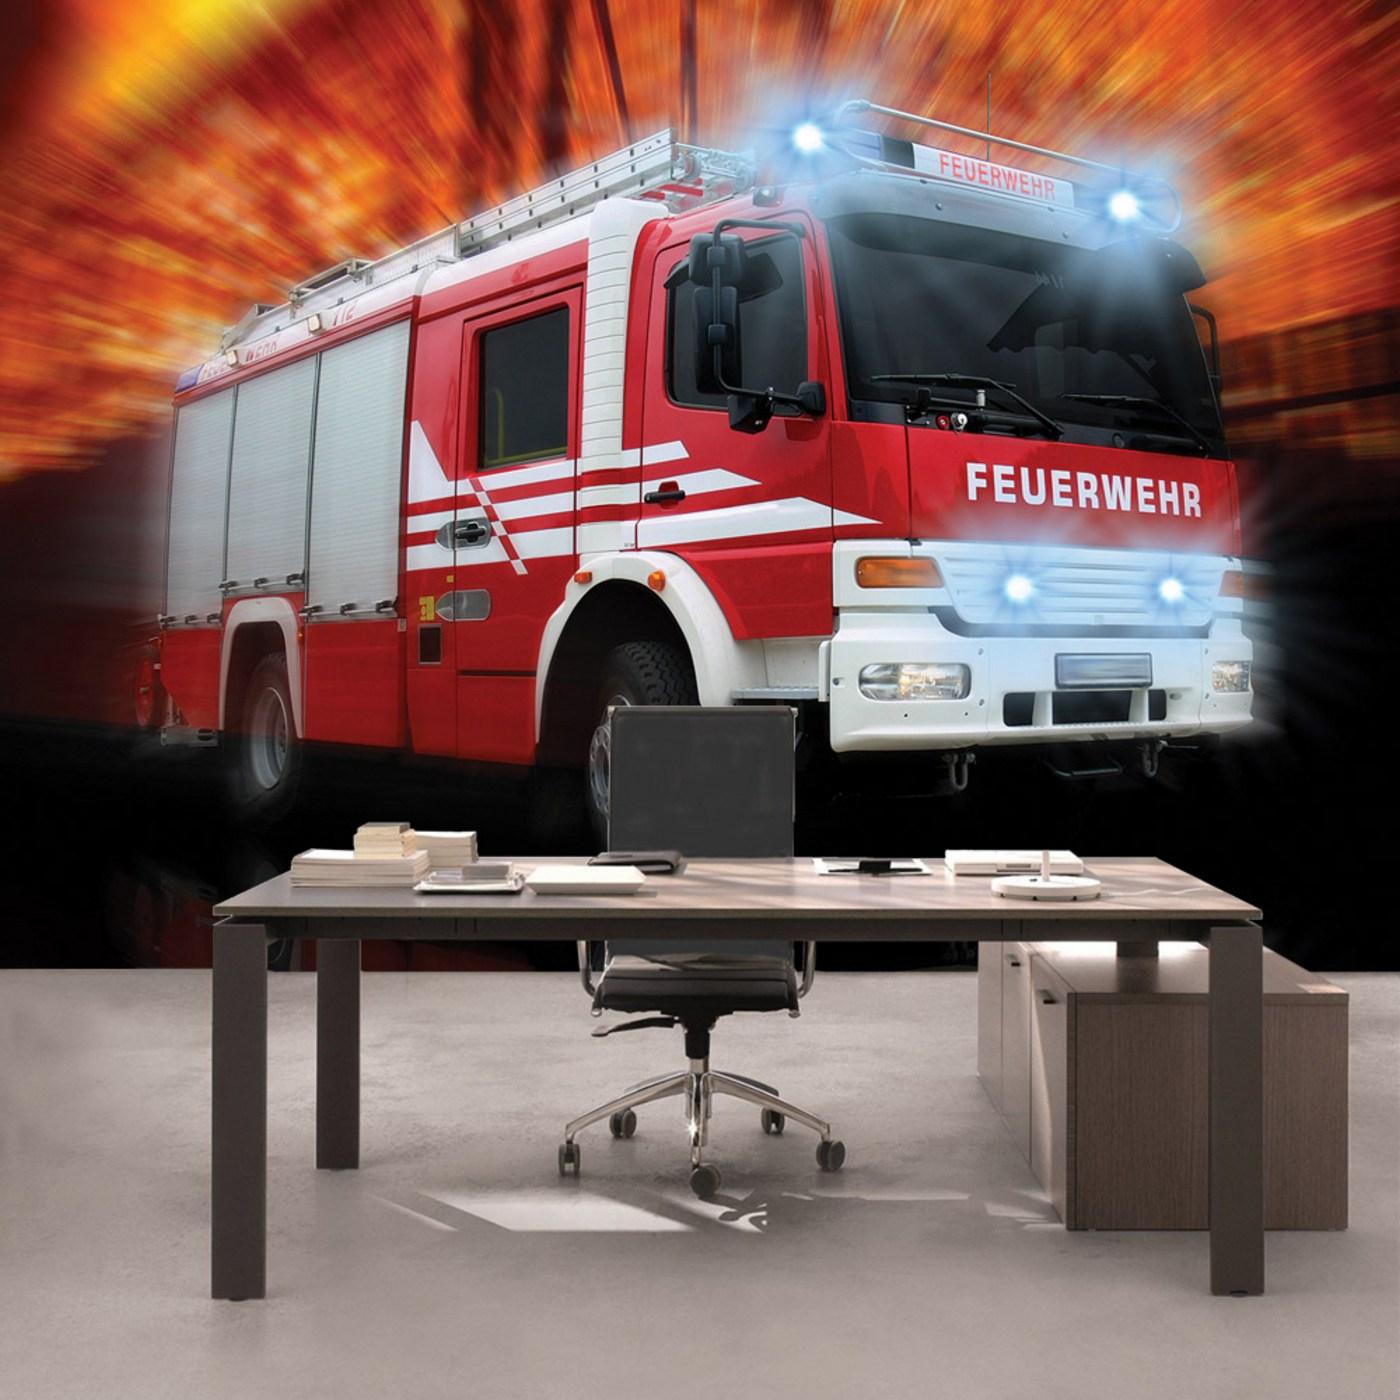 FTVL 2242 400X280 SCENE 8 1000X1000X96 RGB - Tapete Feuerwehr